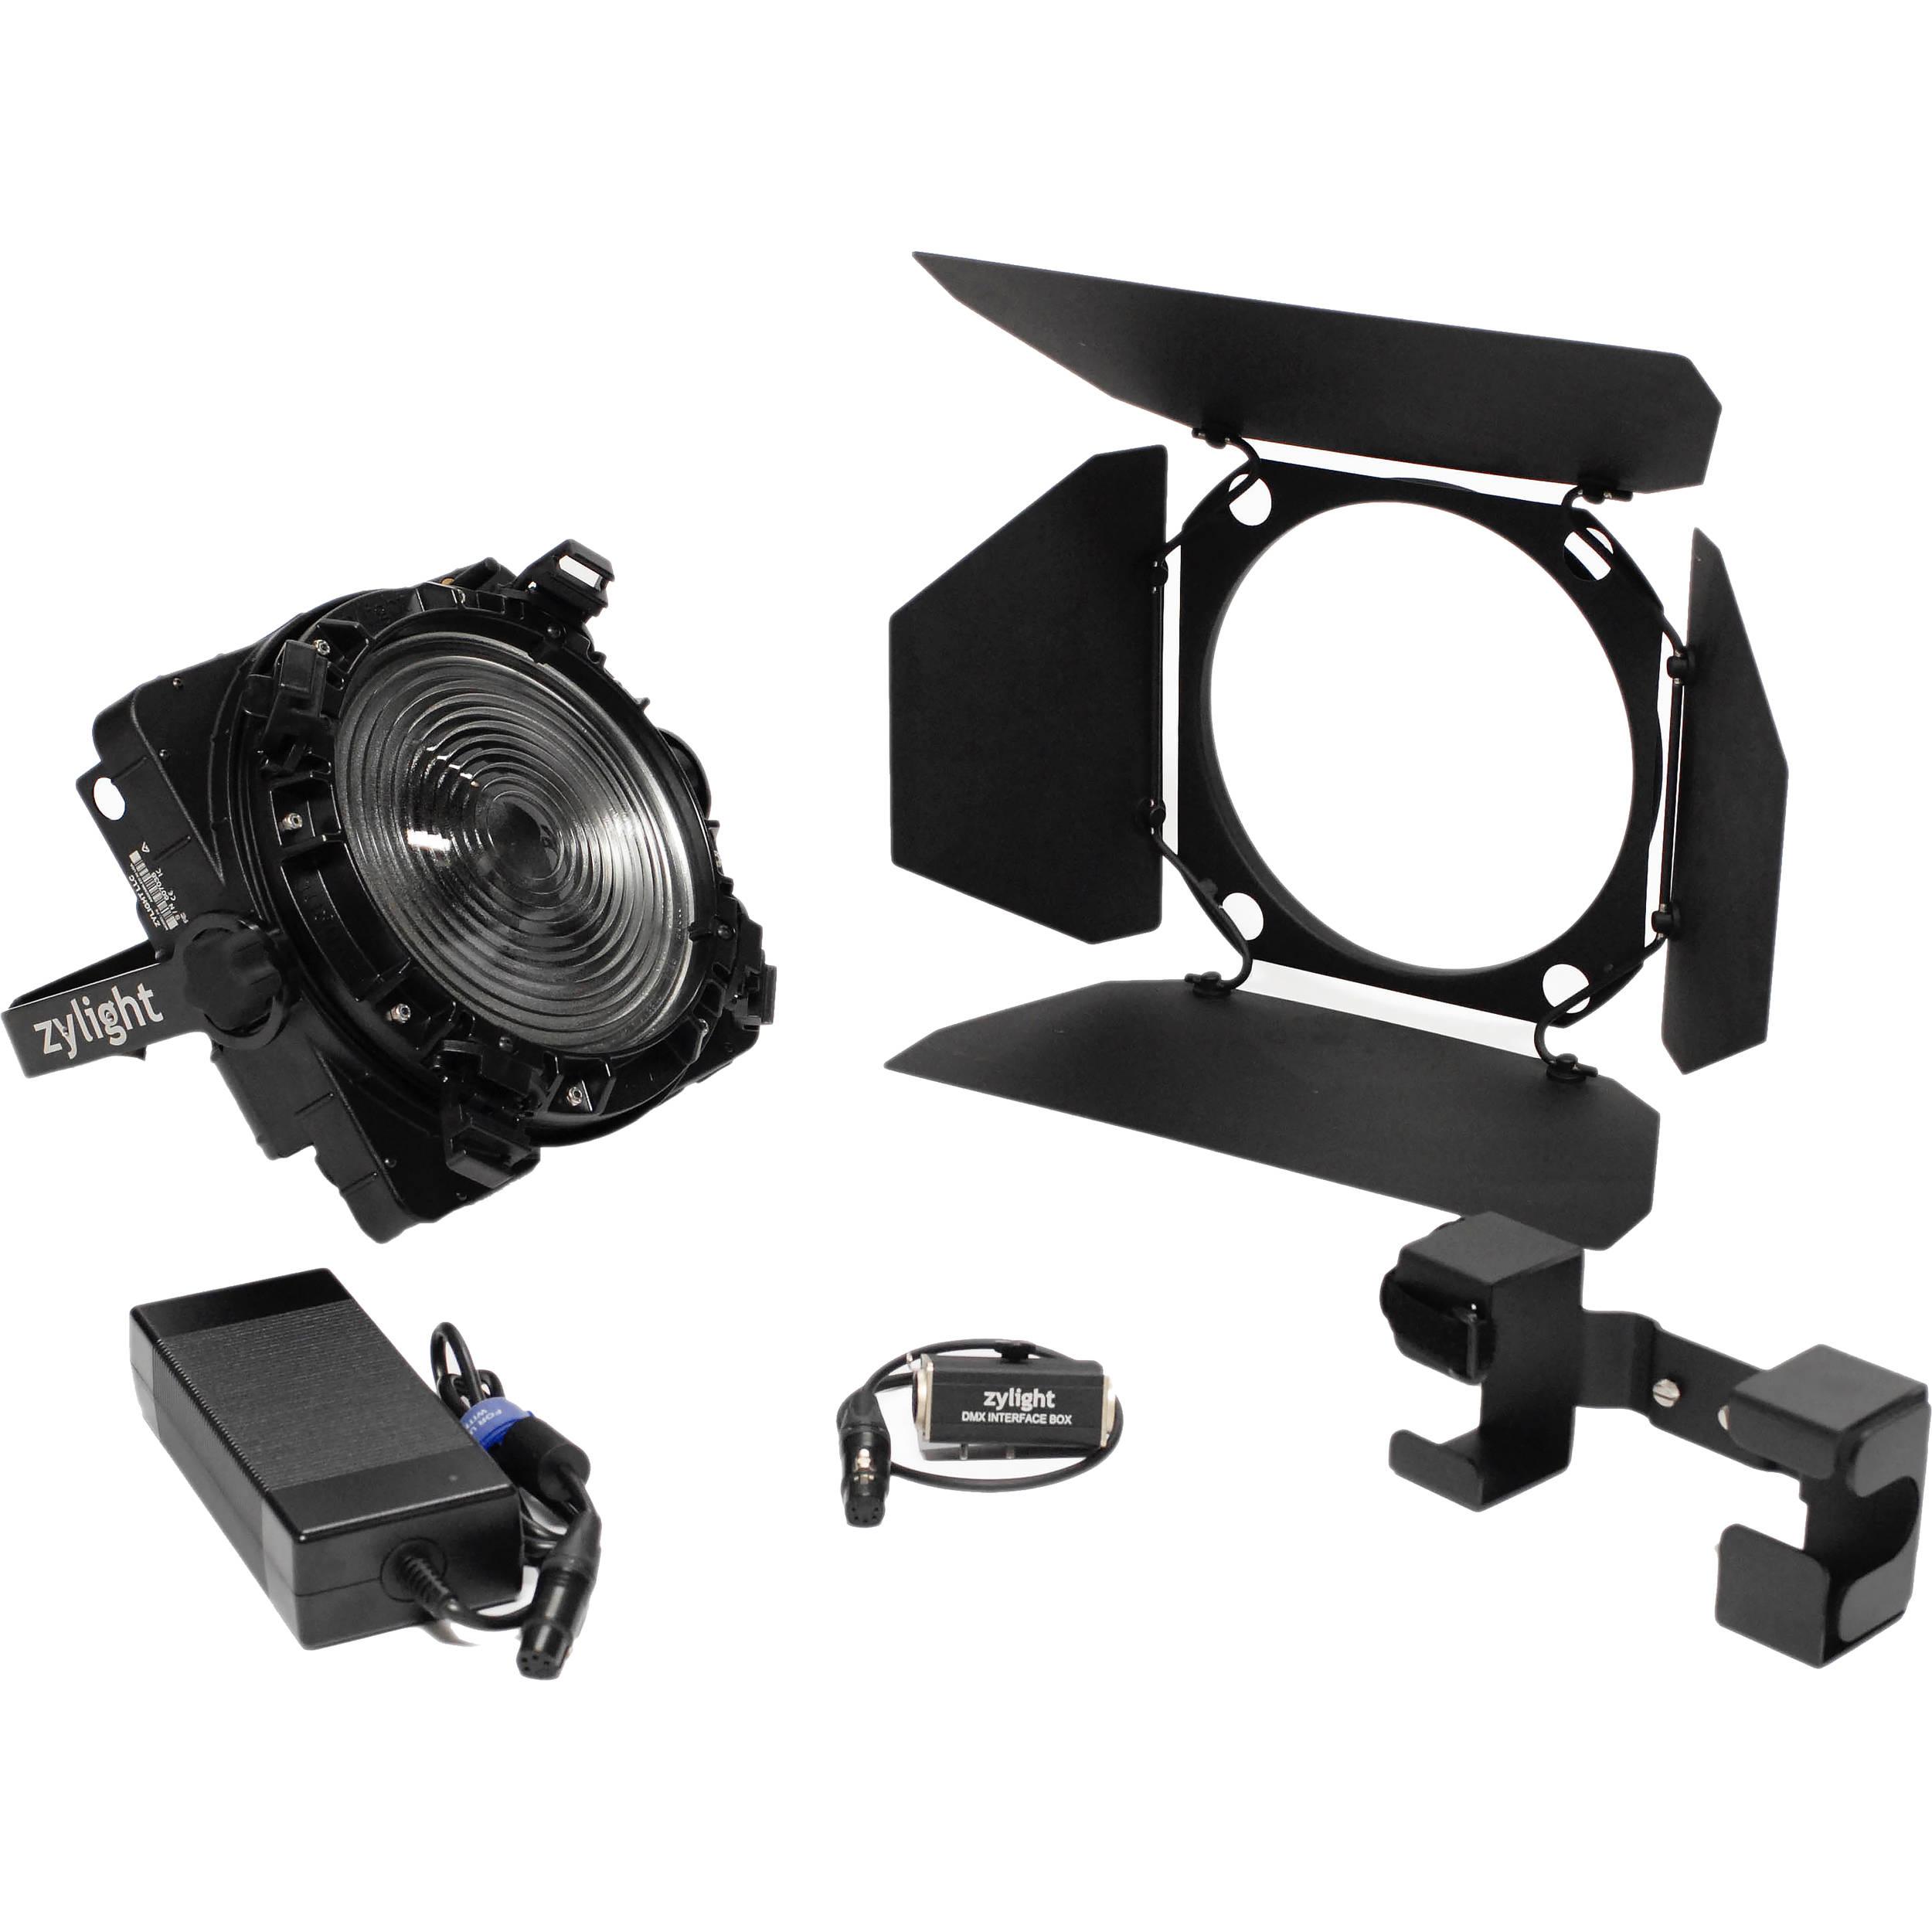 Zylight F8 200 Daylight Led Fresnel Studio Kit 26 01066 B Amp H